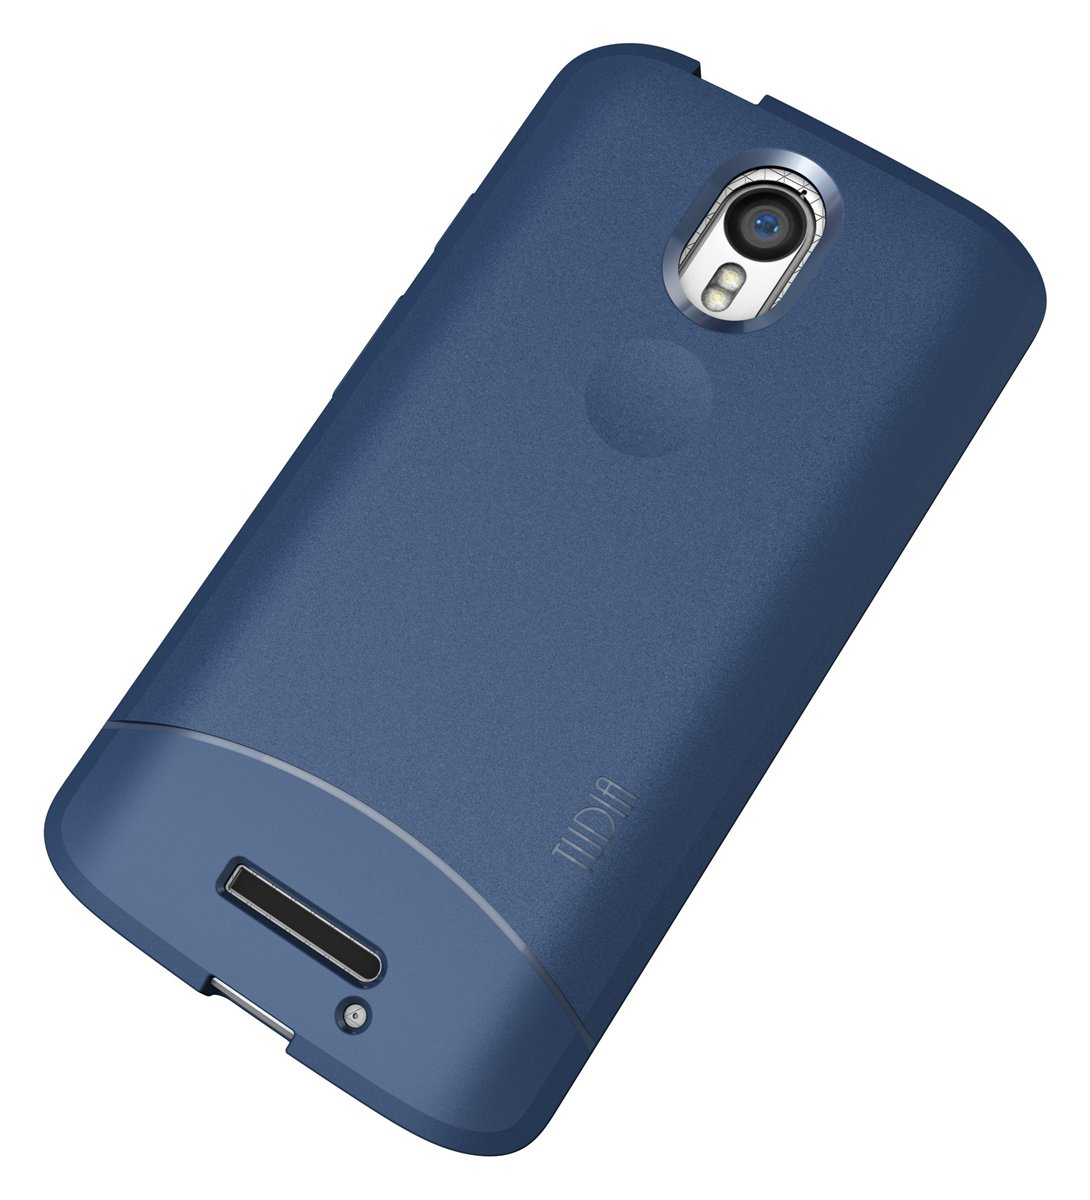 Motorola Droid Turbo 2 (Verizon) / Moto X Force Funda, TUDIA ultra delgado Mate Completa ARCH TPU caso de parachoques de protección Funda Carcasas para ...